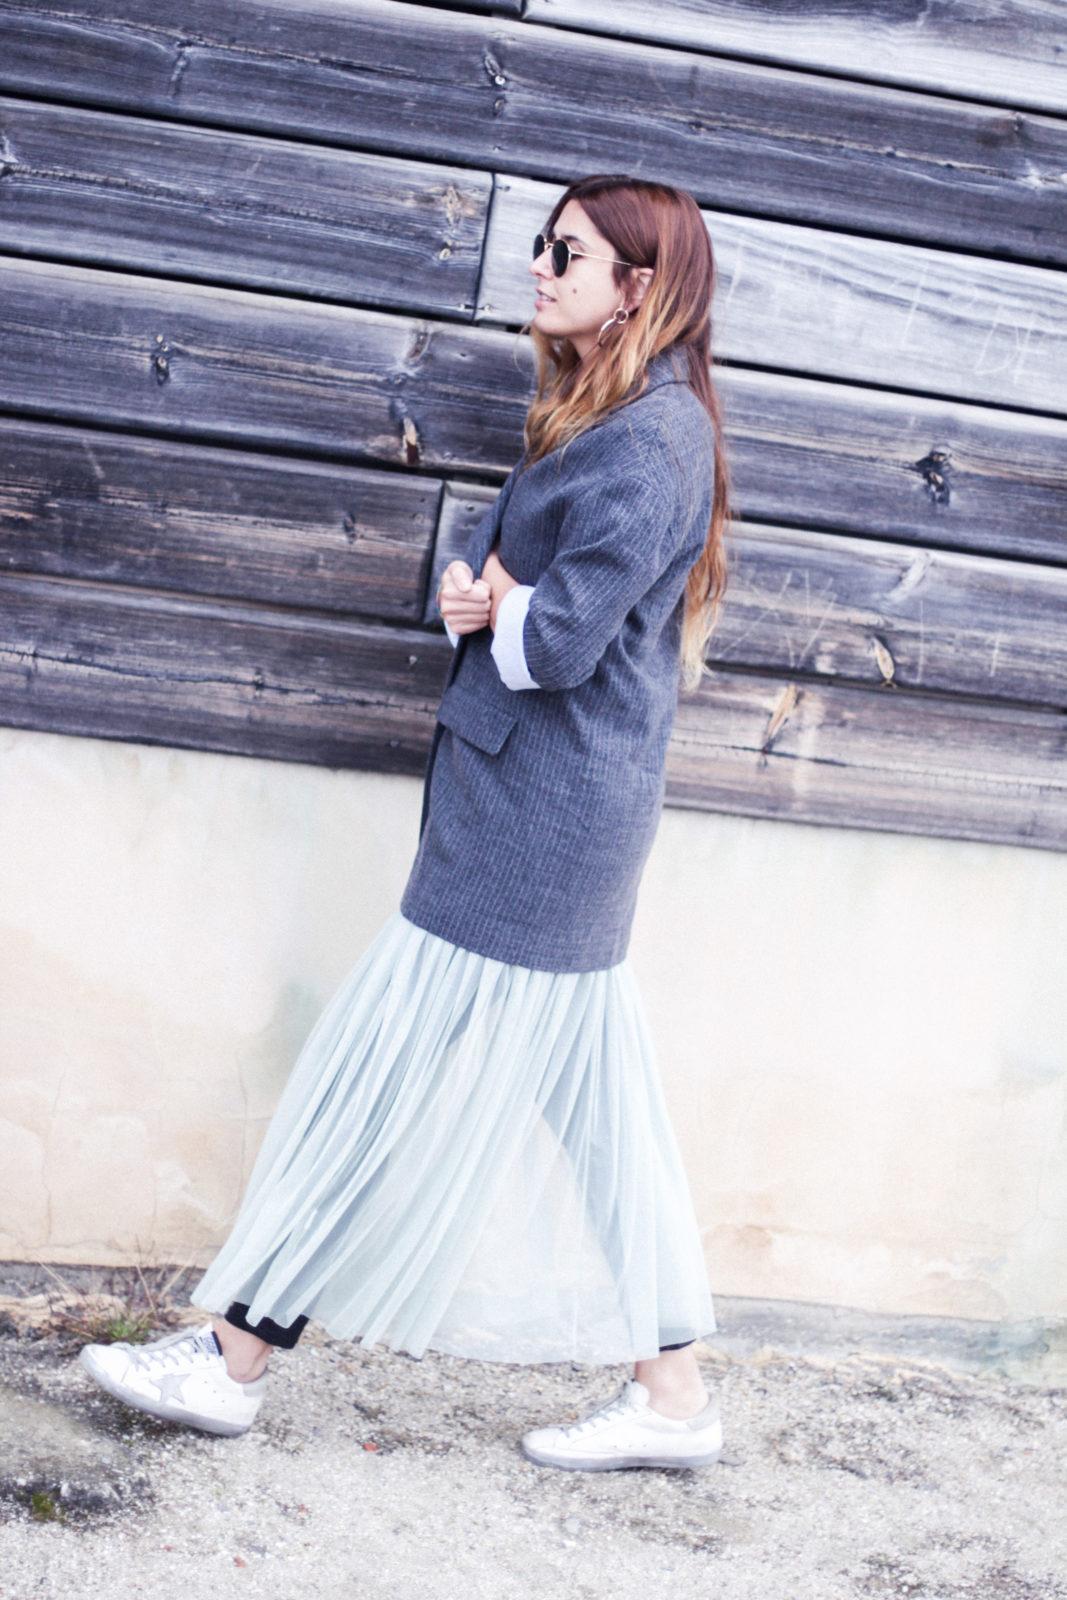 vestido_de_tul_sobre_pantalon_estilo_bailarina_blazer_oversize_pendientes_de_aros_choker_tendencias_trends_fall_2016_street_style_donkeycool-39